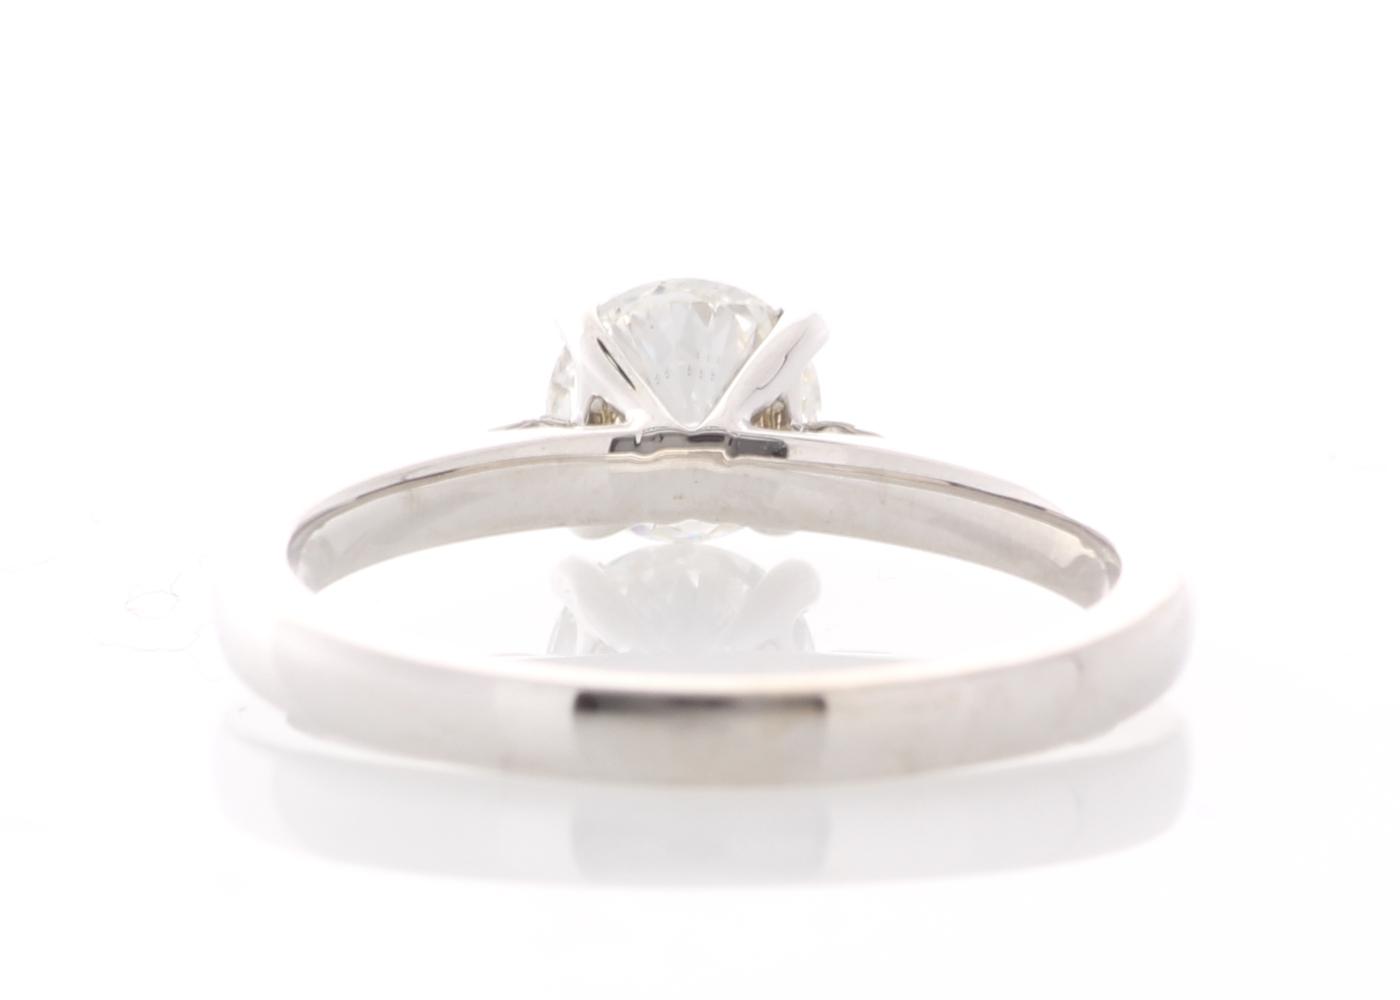 18ct White Gold Single Stone Prong Set Diamond Ring 0.73 Carats - Image 3 of 5